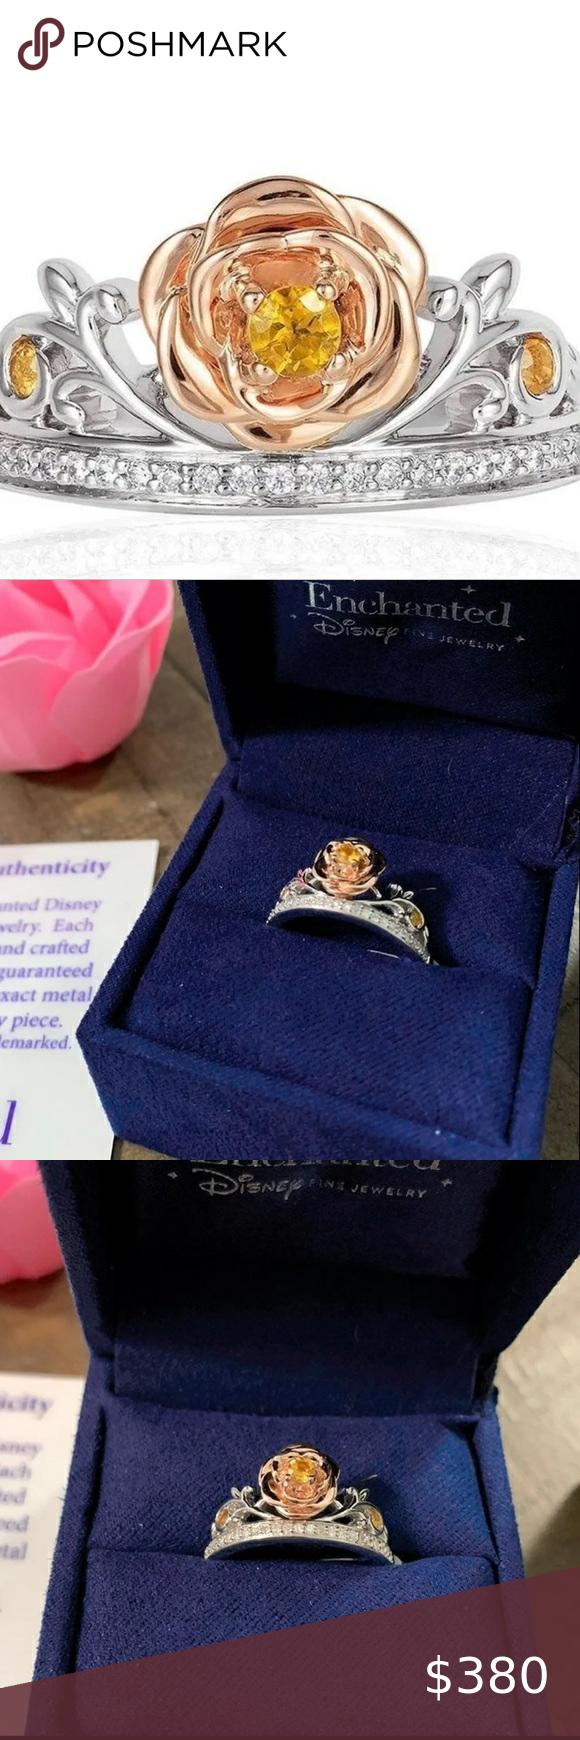 26++ Disney enchanted jewelry beauty and the beast ideas